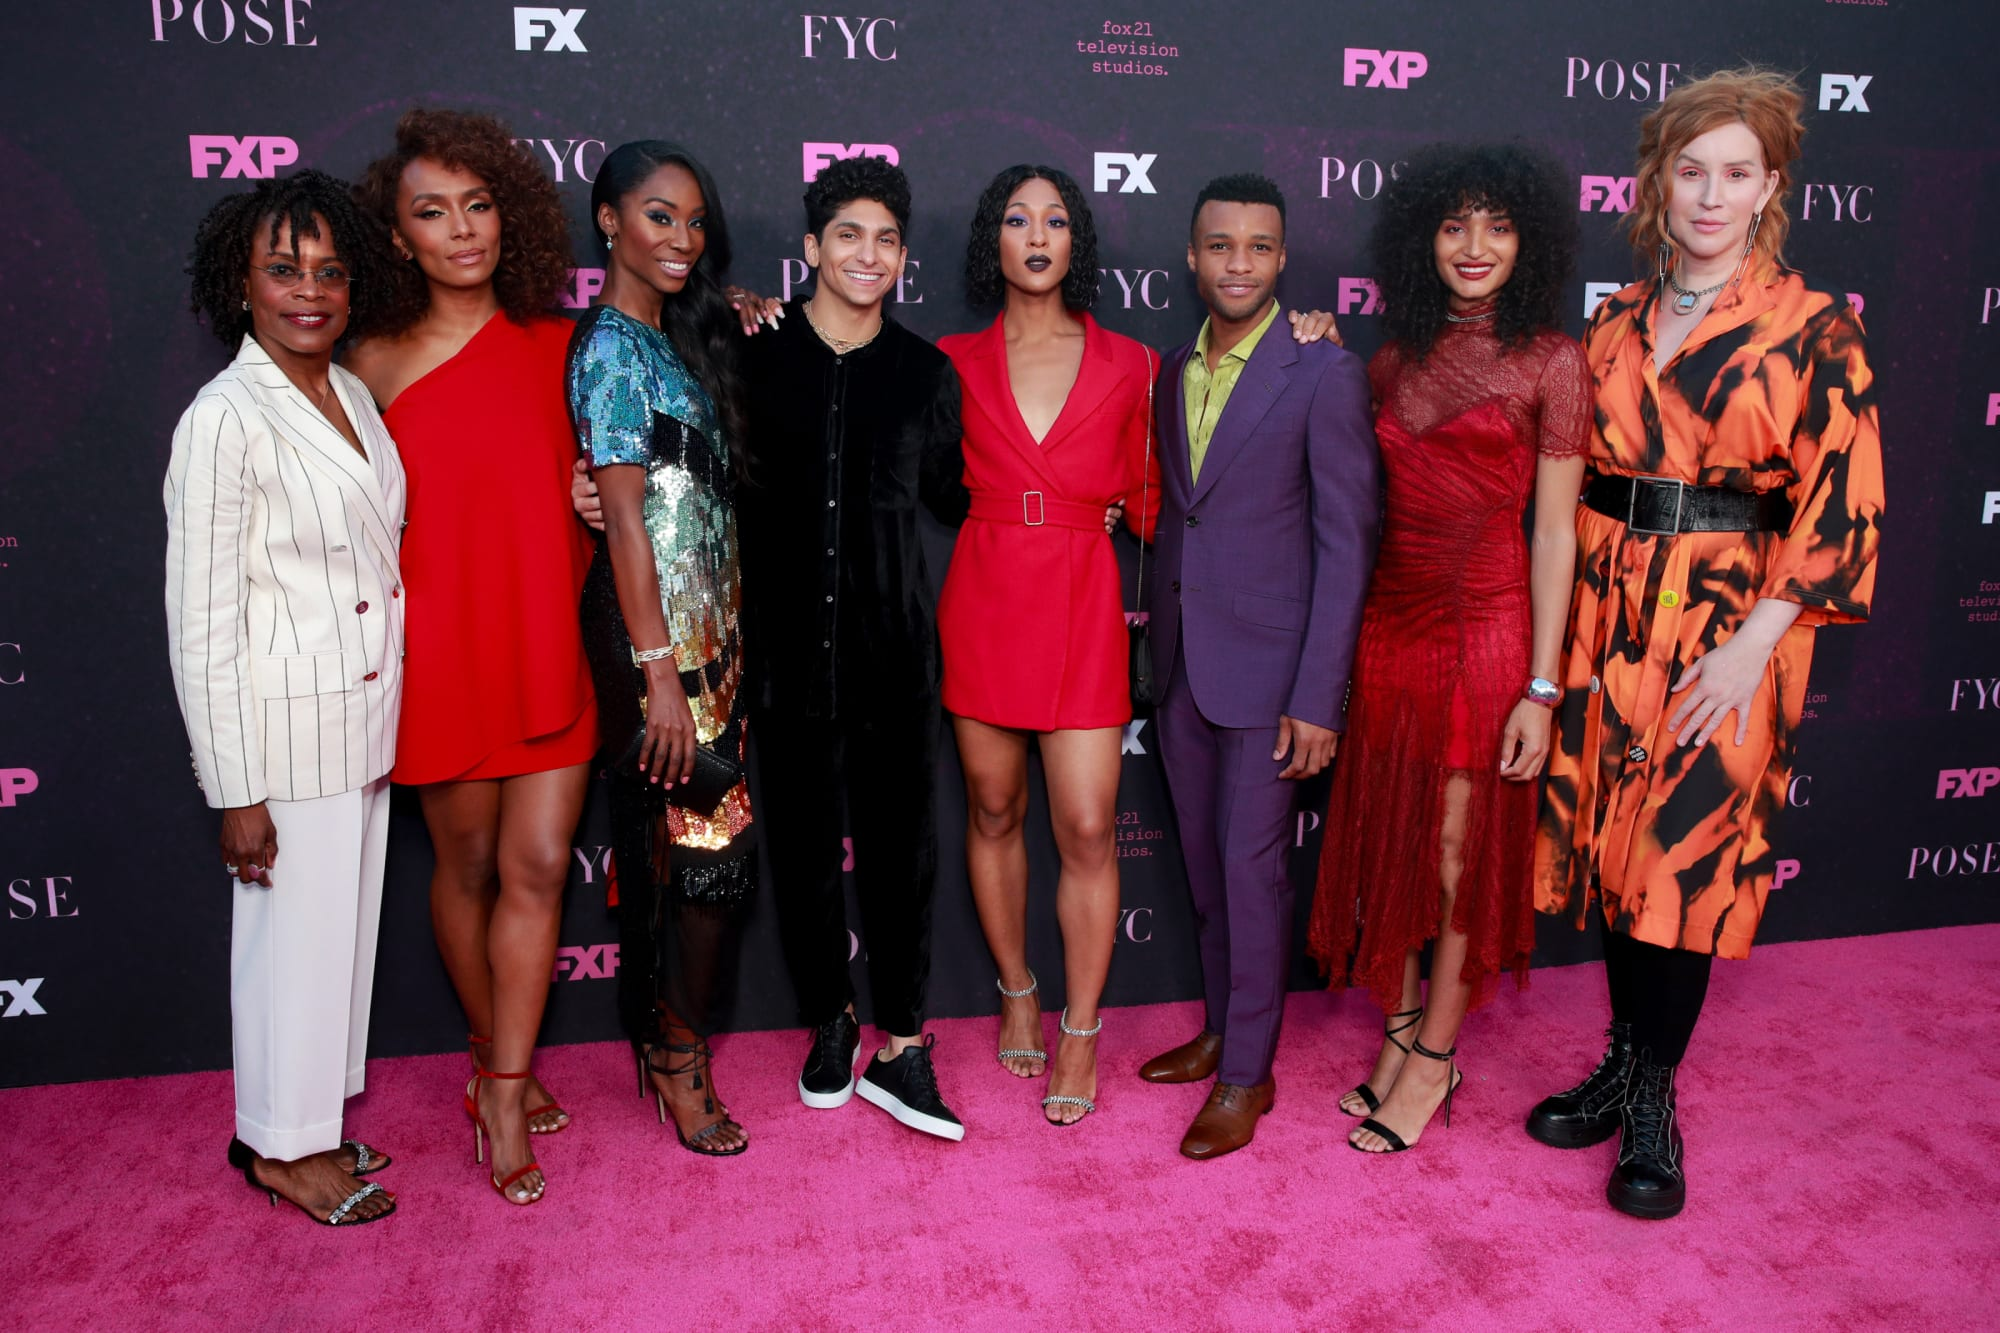 Pose Season 3 premiere recap: The ballroom scene returns for one last hurrah!